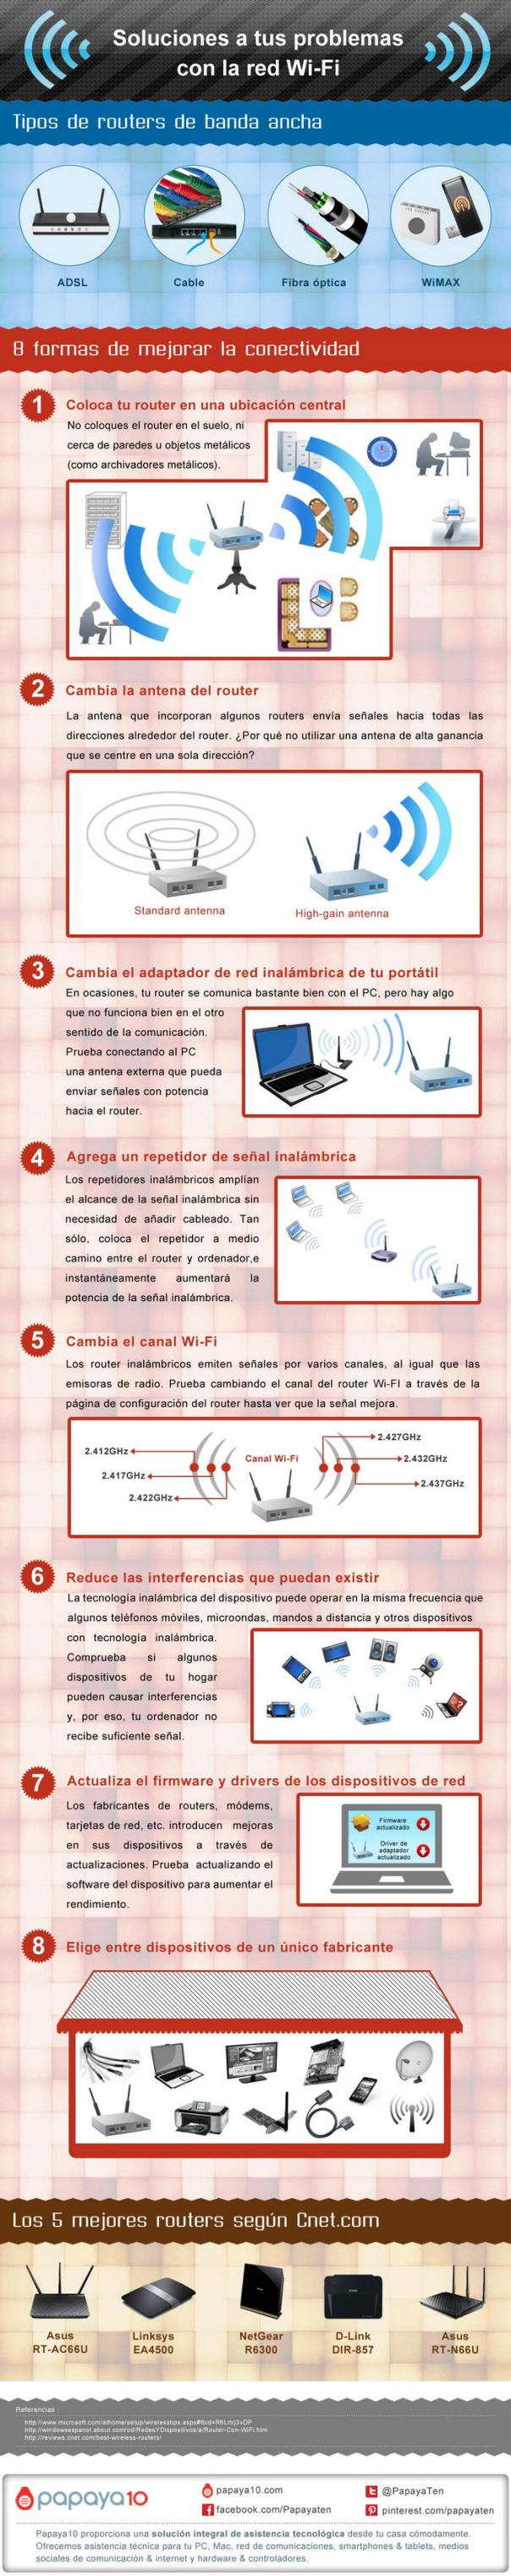 Soluciones a tus problemas con la red Wi-Fi